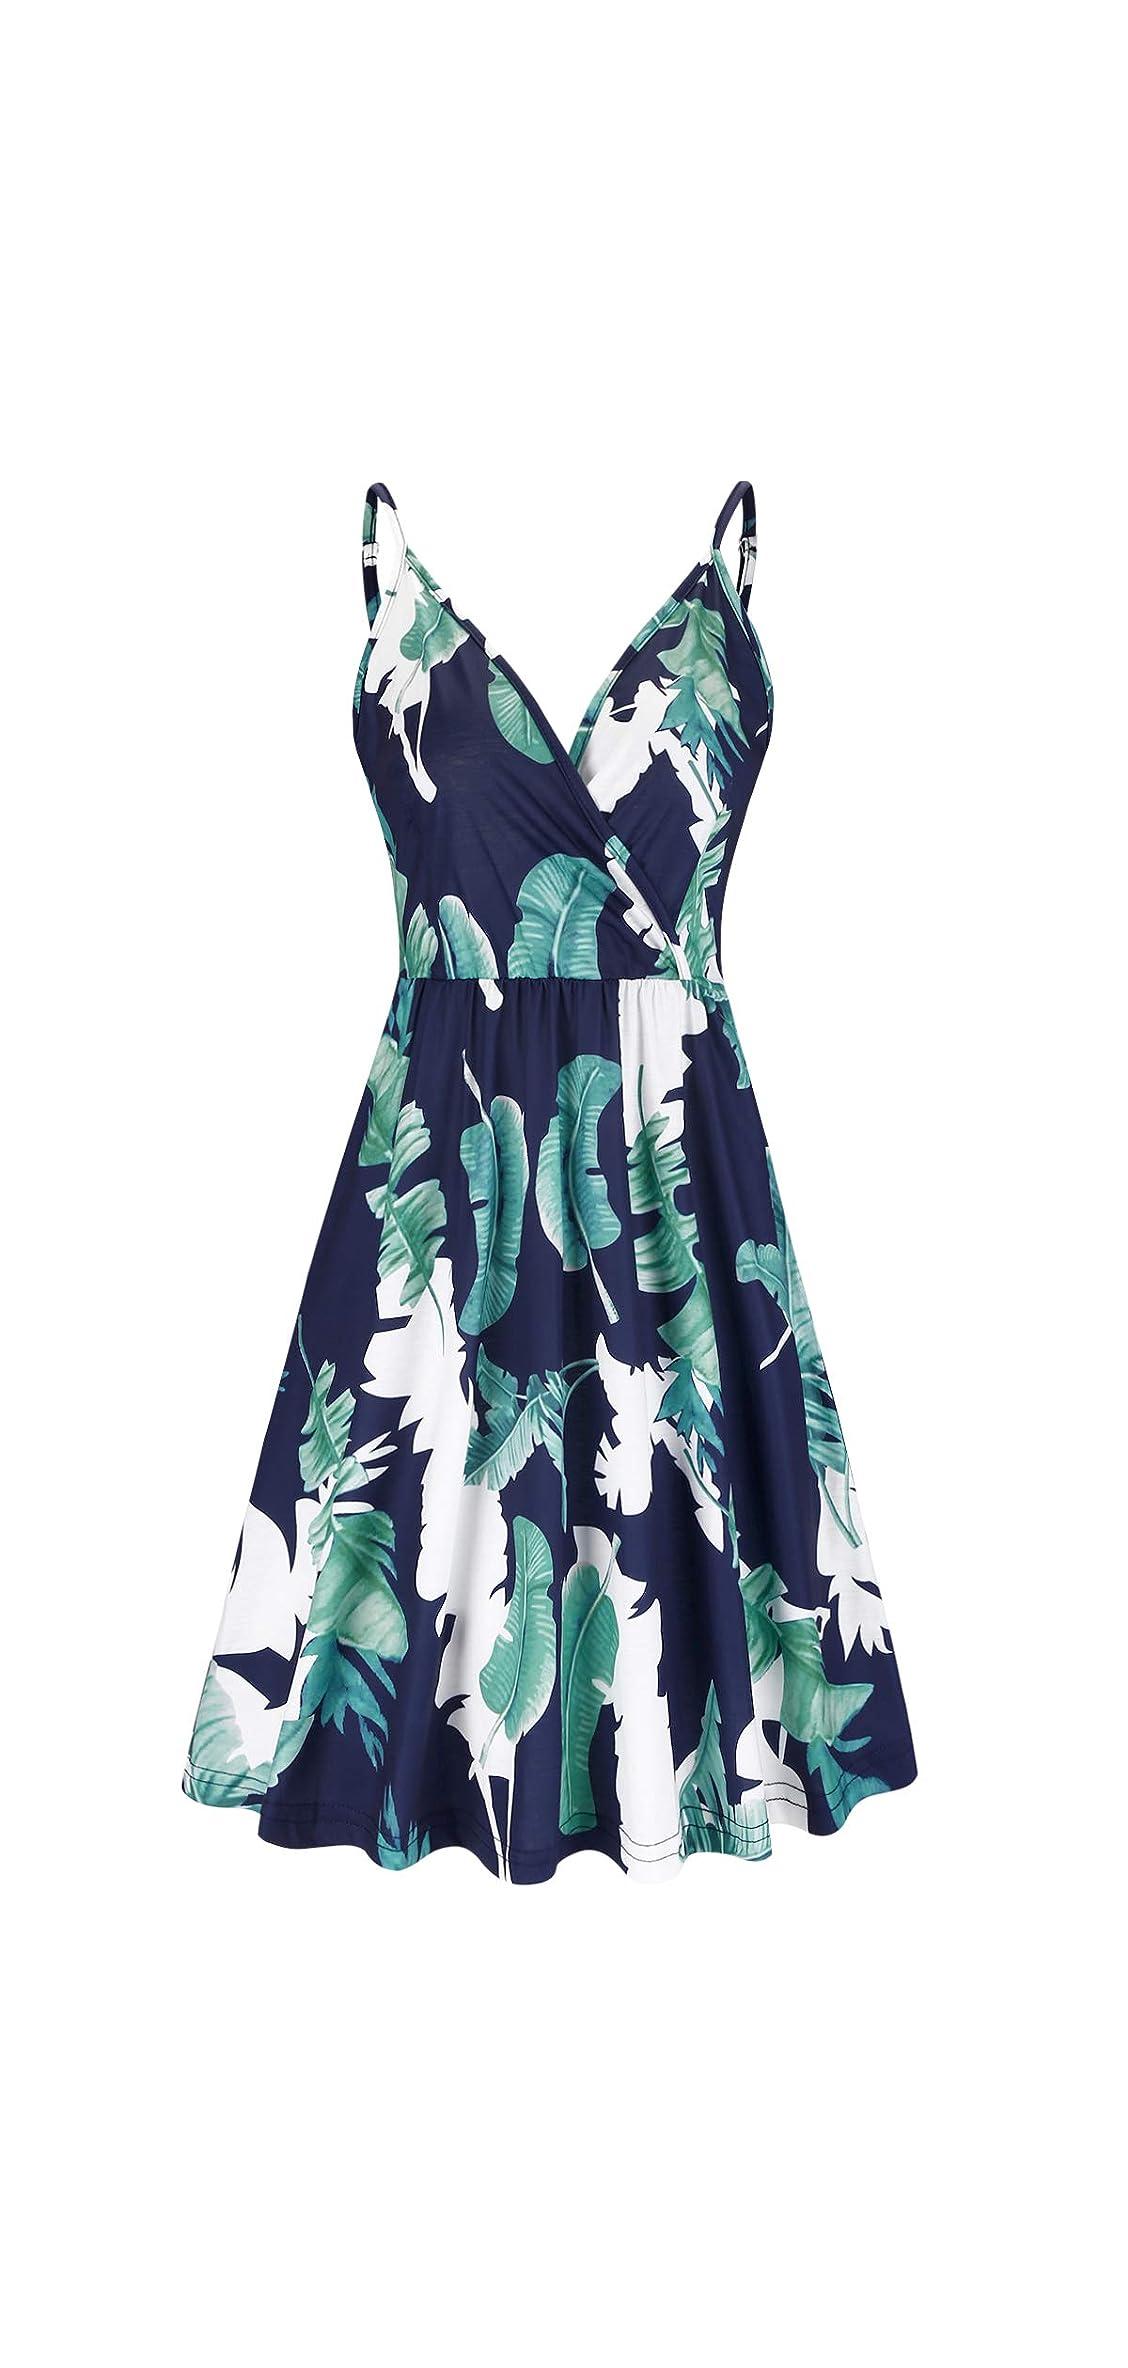 Women's V-neck Floral Spaghetti Strap Dress Summer